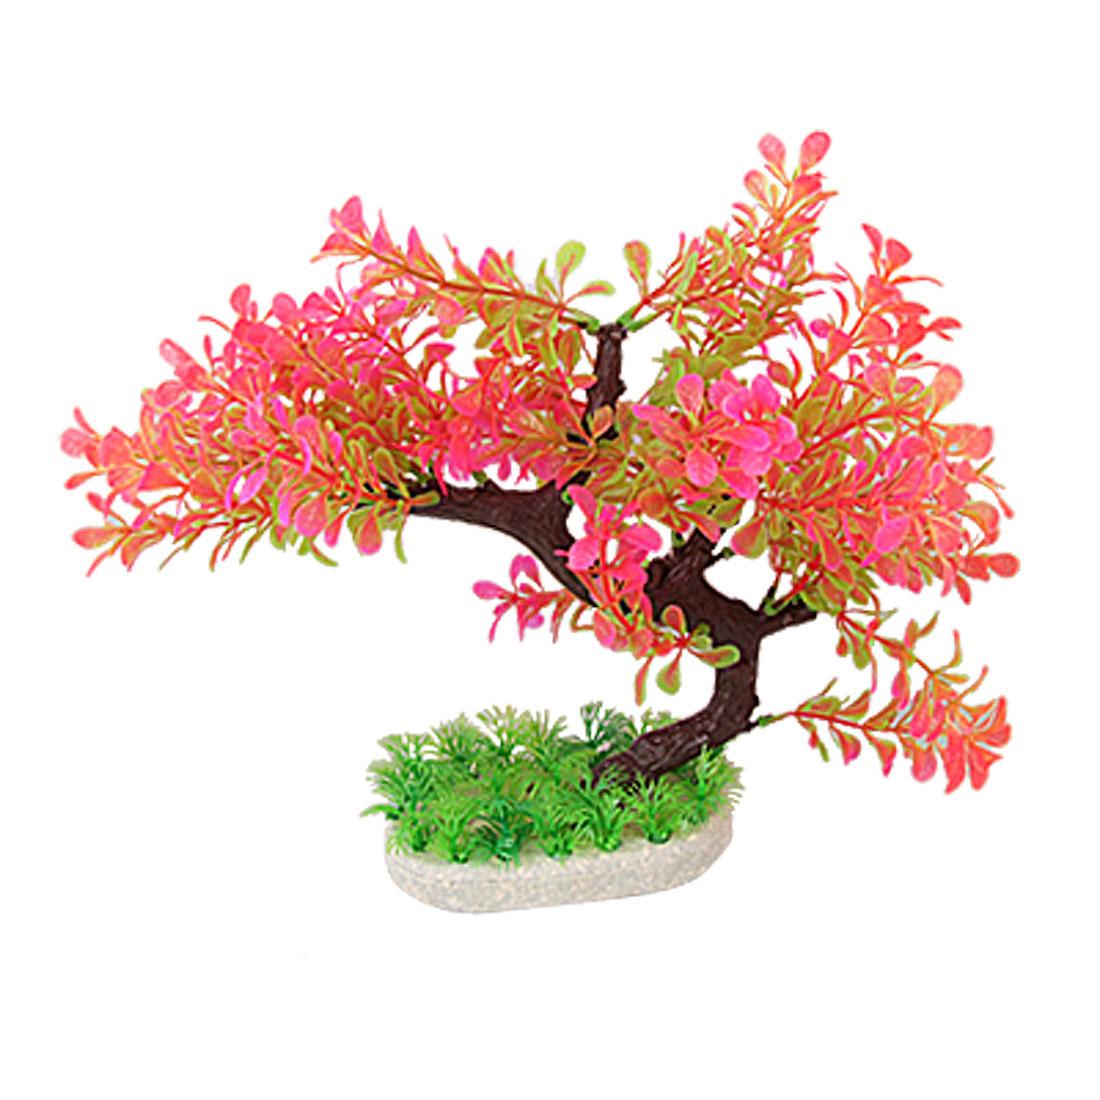 "10.2"" Height Hot Magenta Green Fish Tank Plastic Tree Plants Ornament"